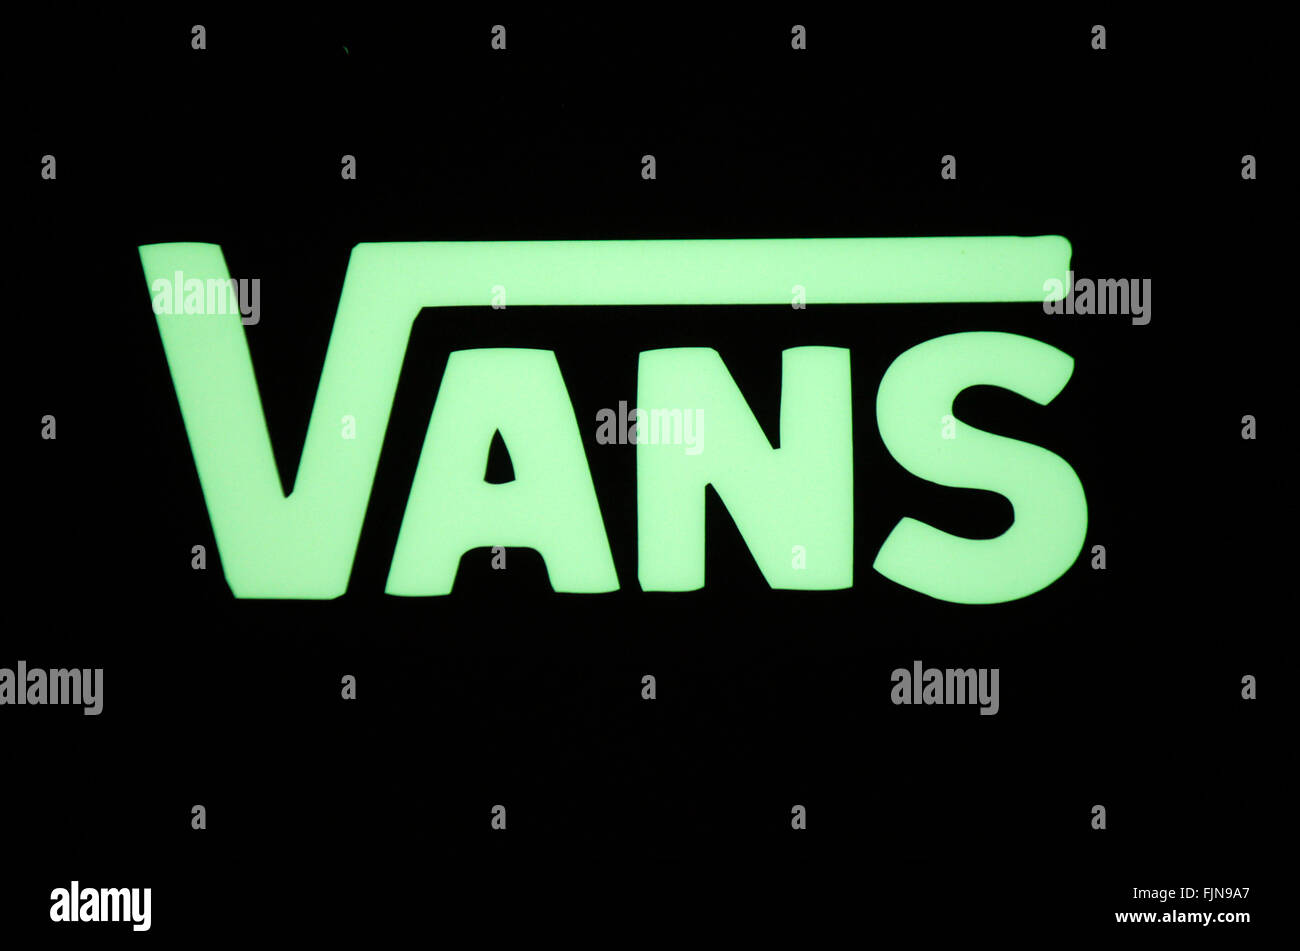 Markenname: 'Vans', Berlin. - Stock Image